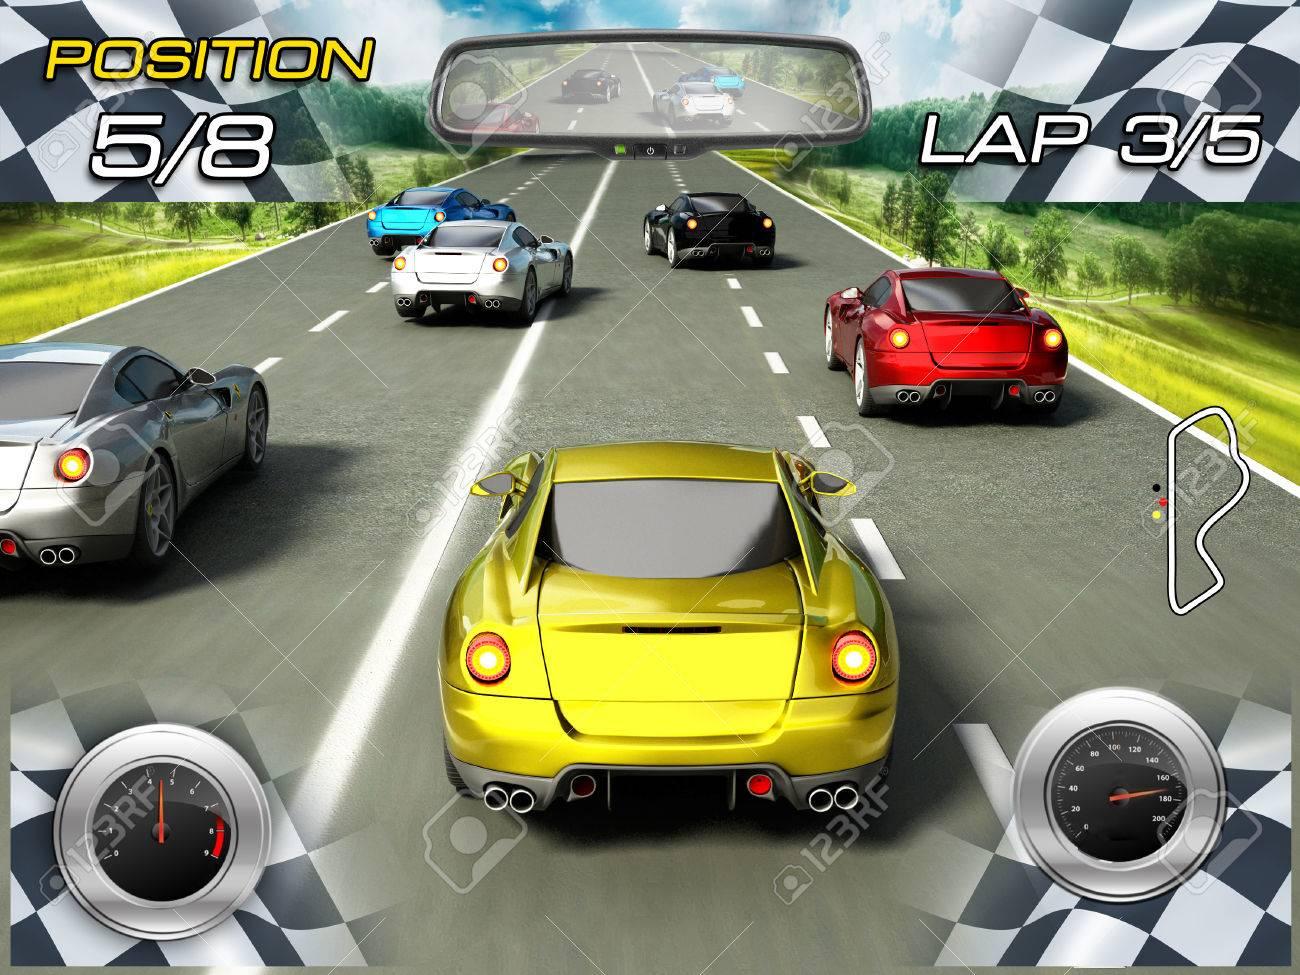 Car racing video game Stock Photo - 31396730